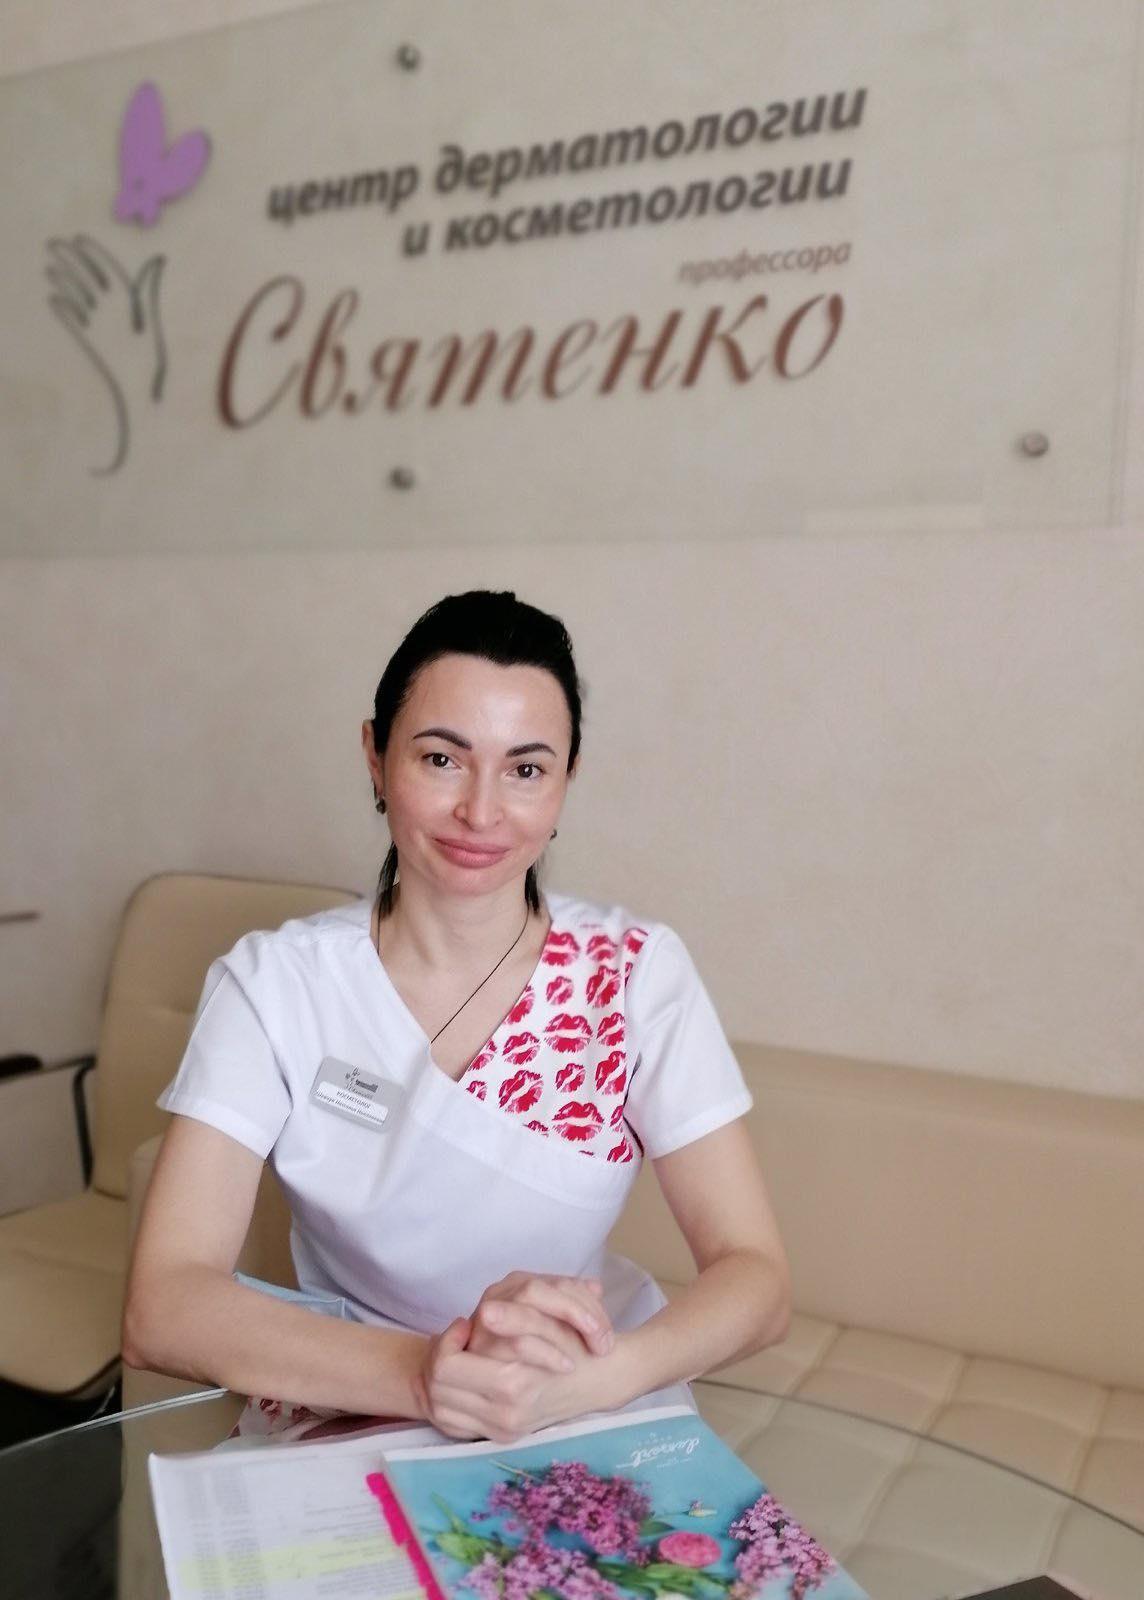 Шевчук Наталья Викторовна